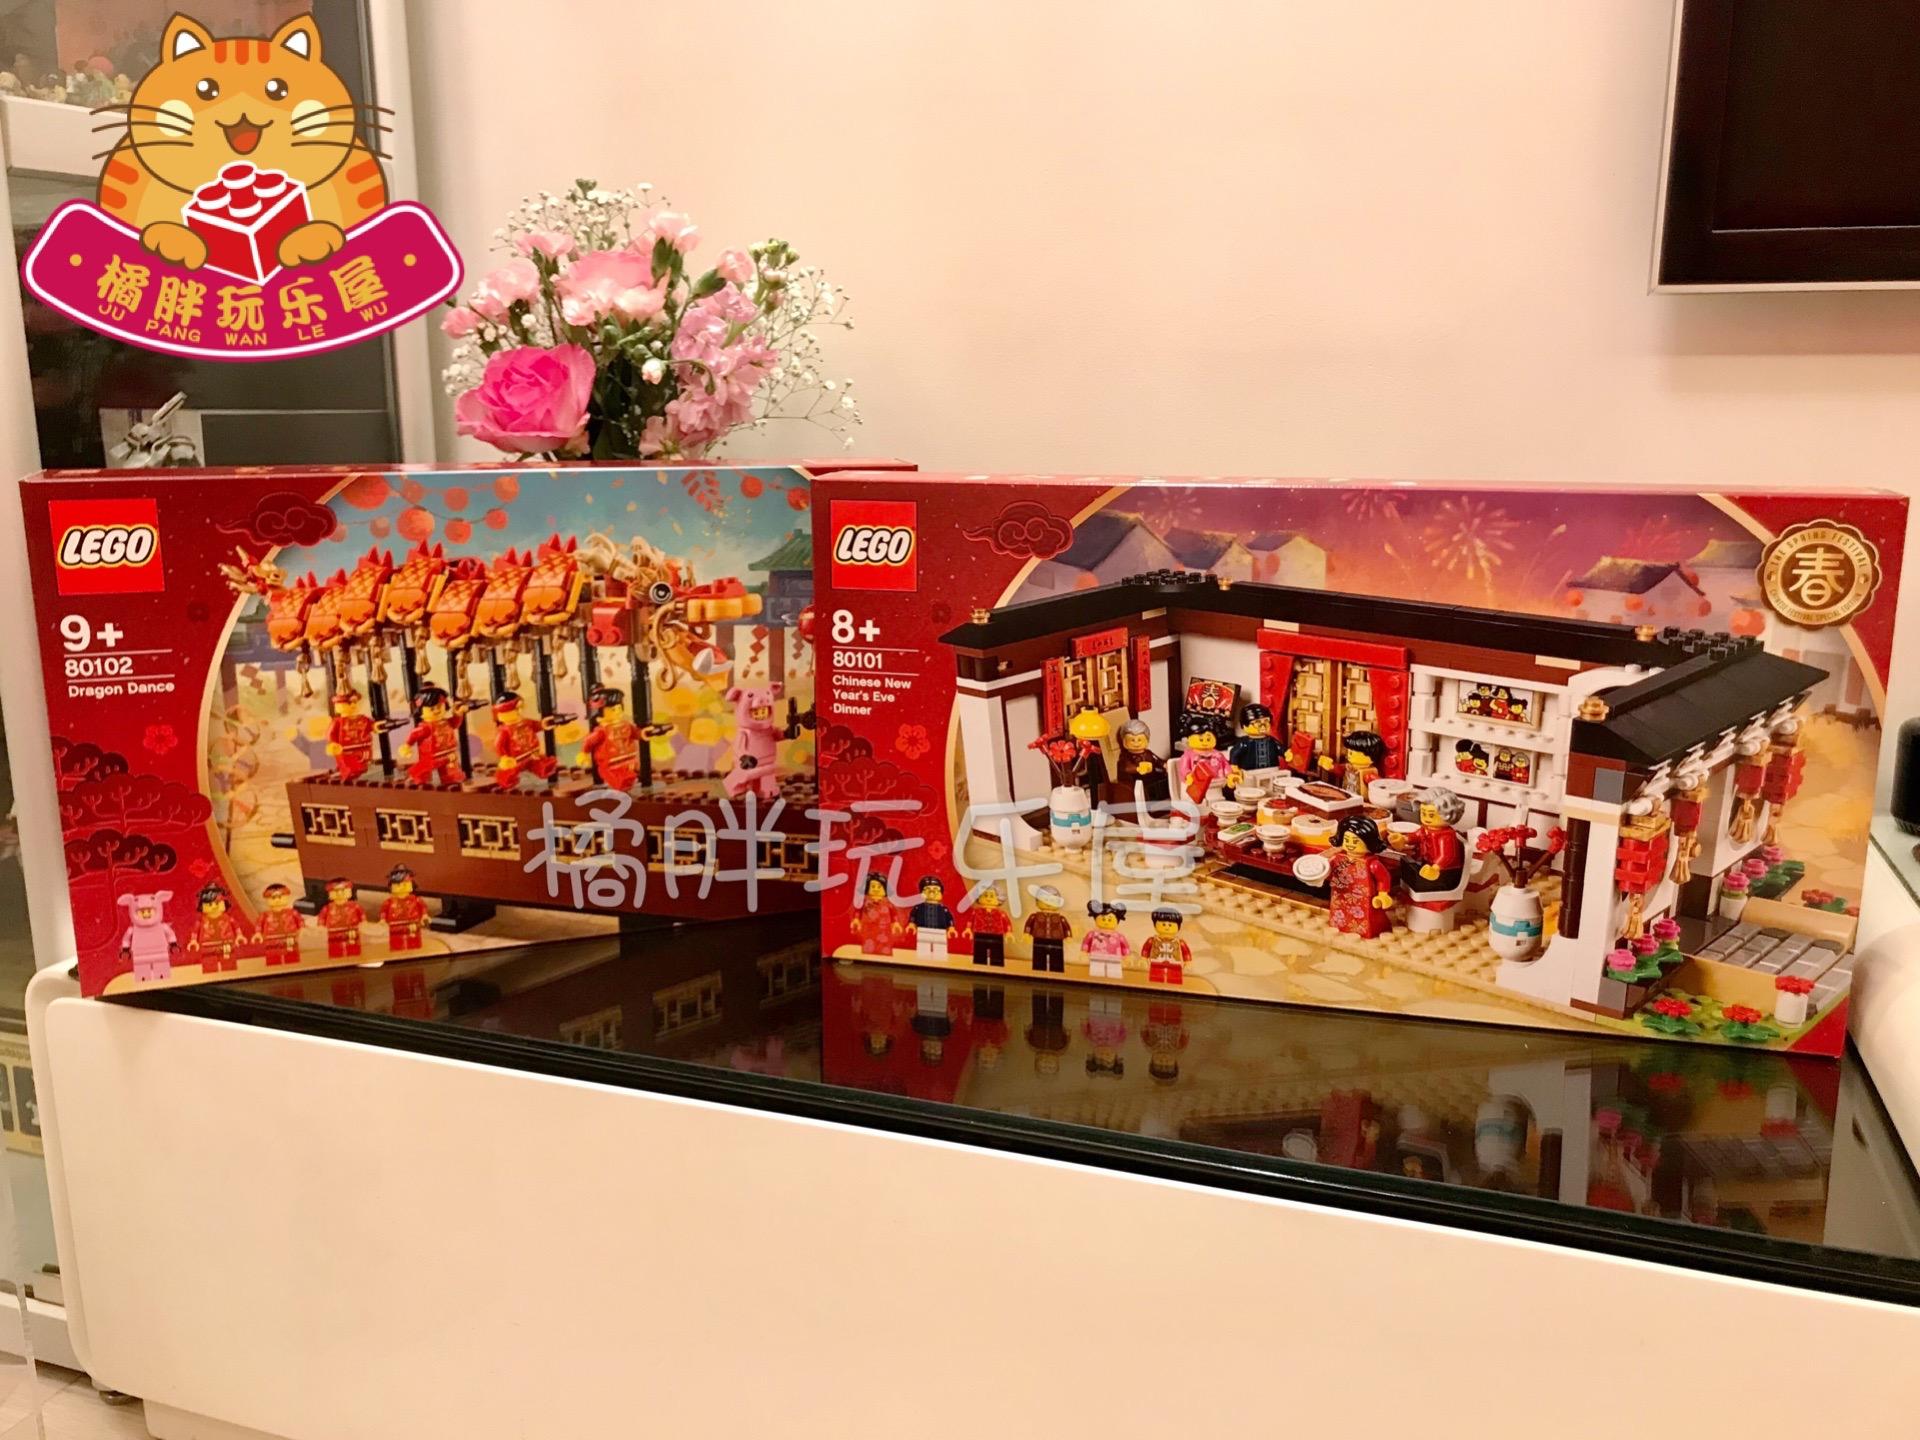 LEGO樂高新春系列80101年夜飯80102舞龍新年中國風限定絕版80103